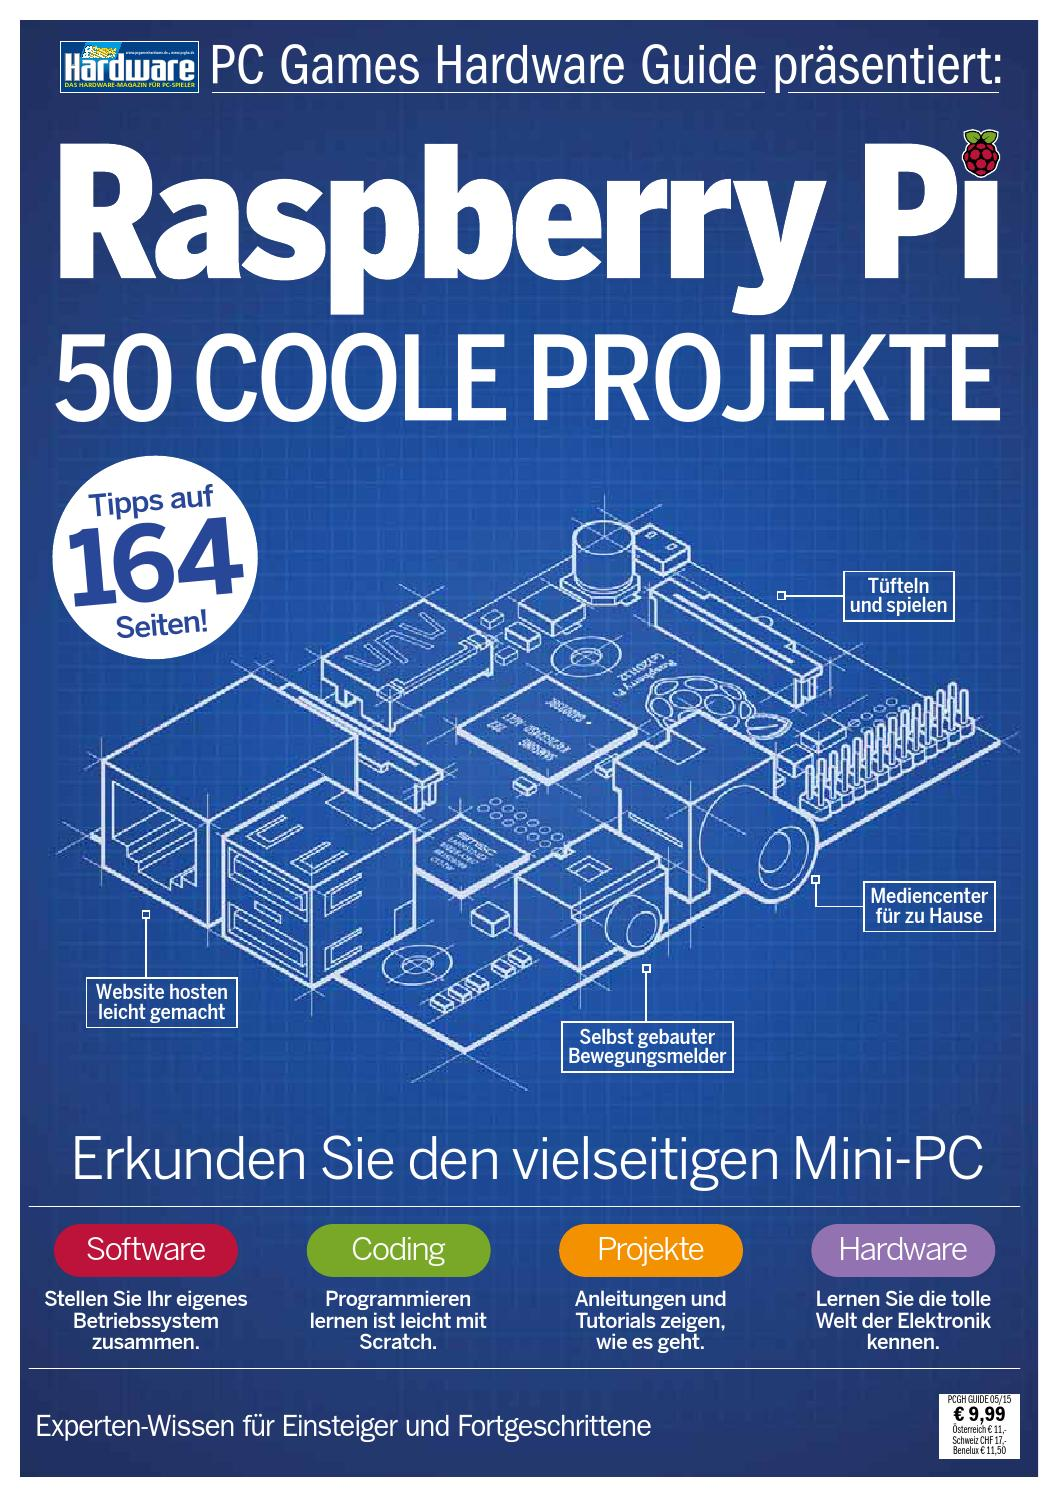 Raspberry Pi 50 Coole Projekte by Zockerstübchen - issuu